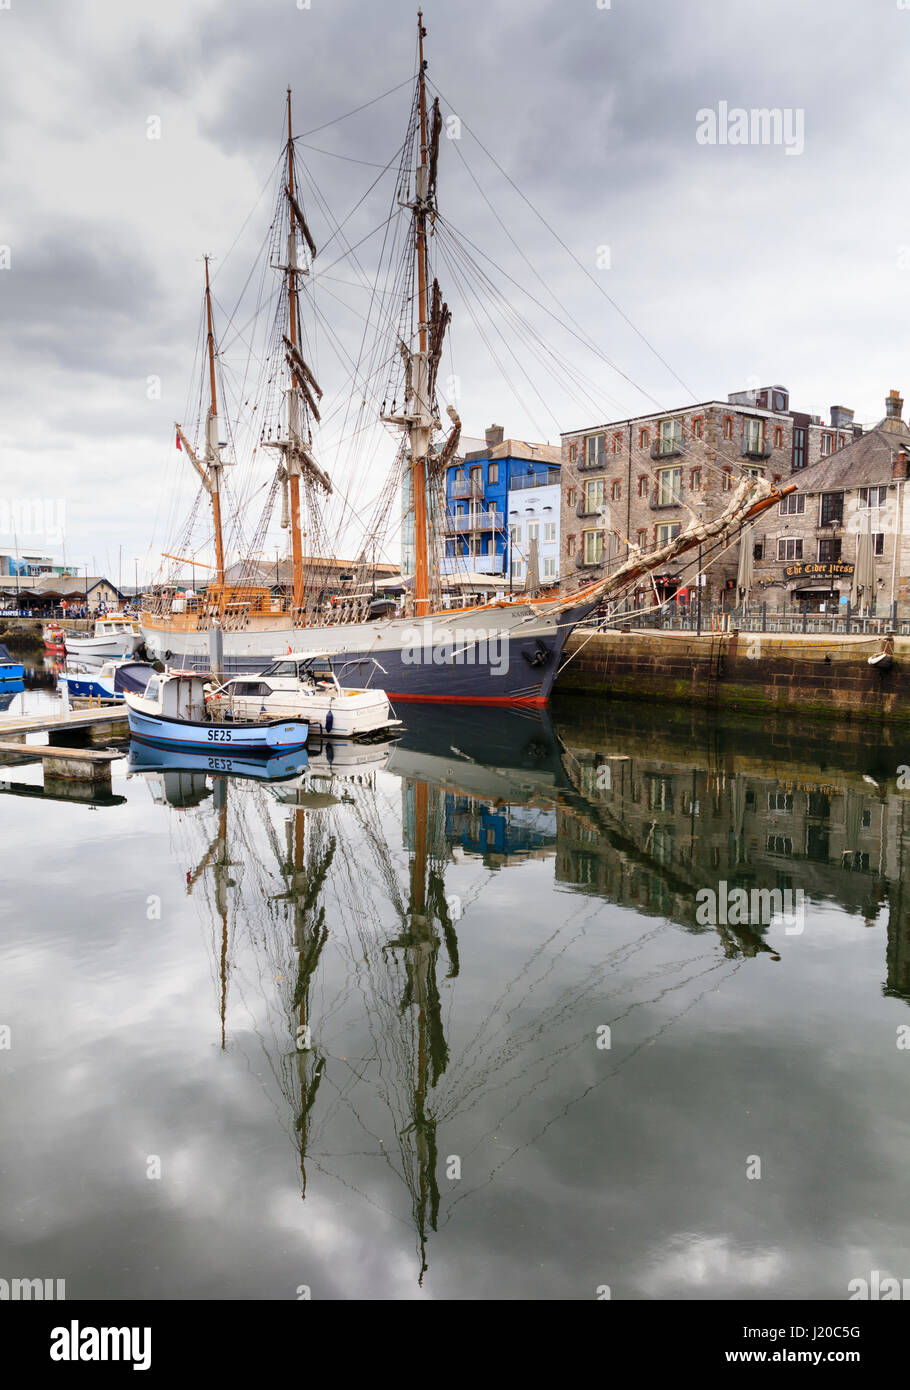 tall-ship-svkaskelot-moored-alongside-th